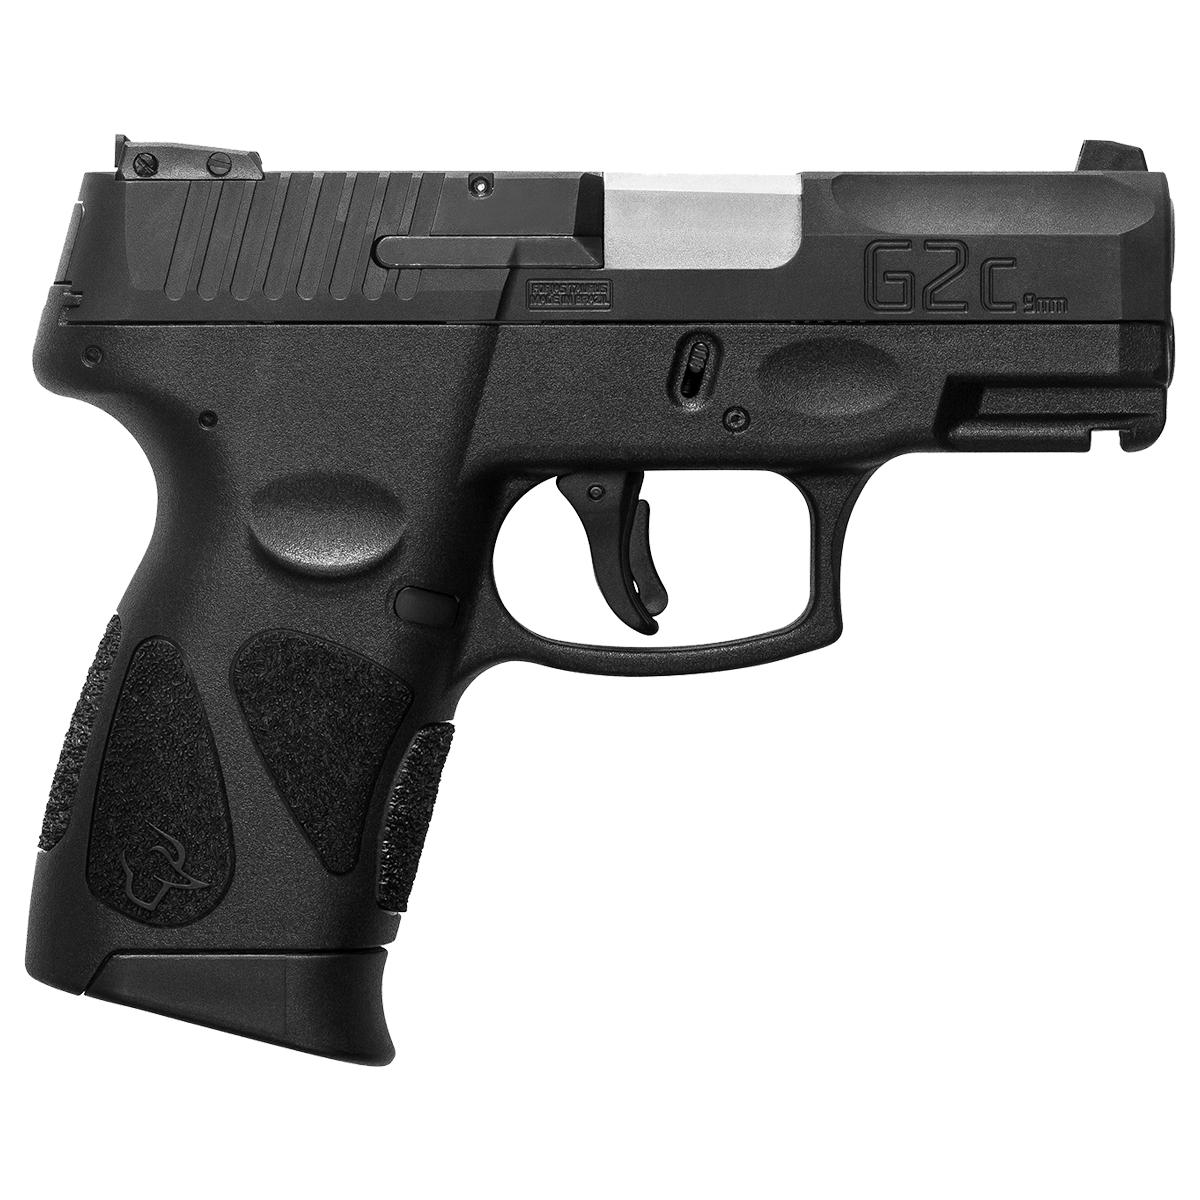 Pistola G2c - 9mm